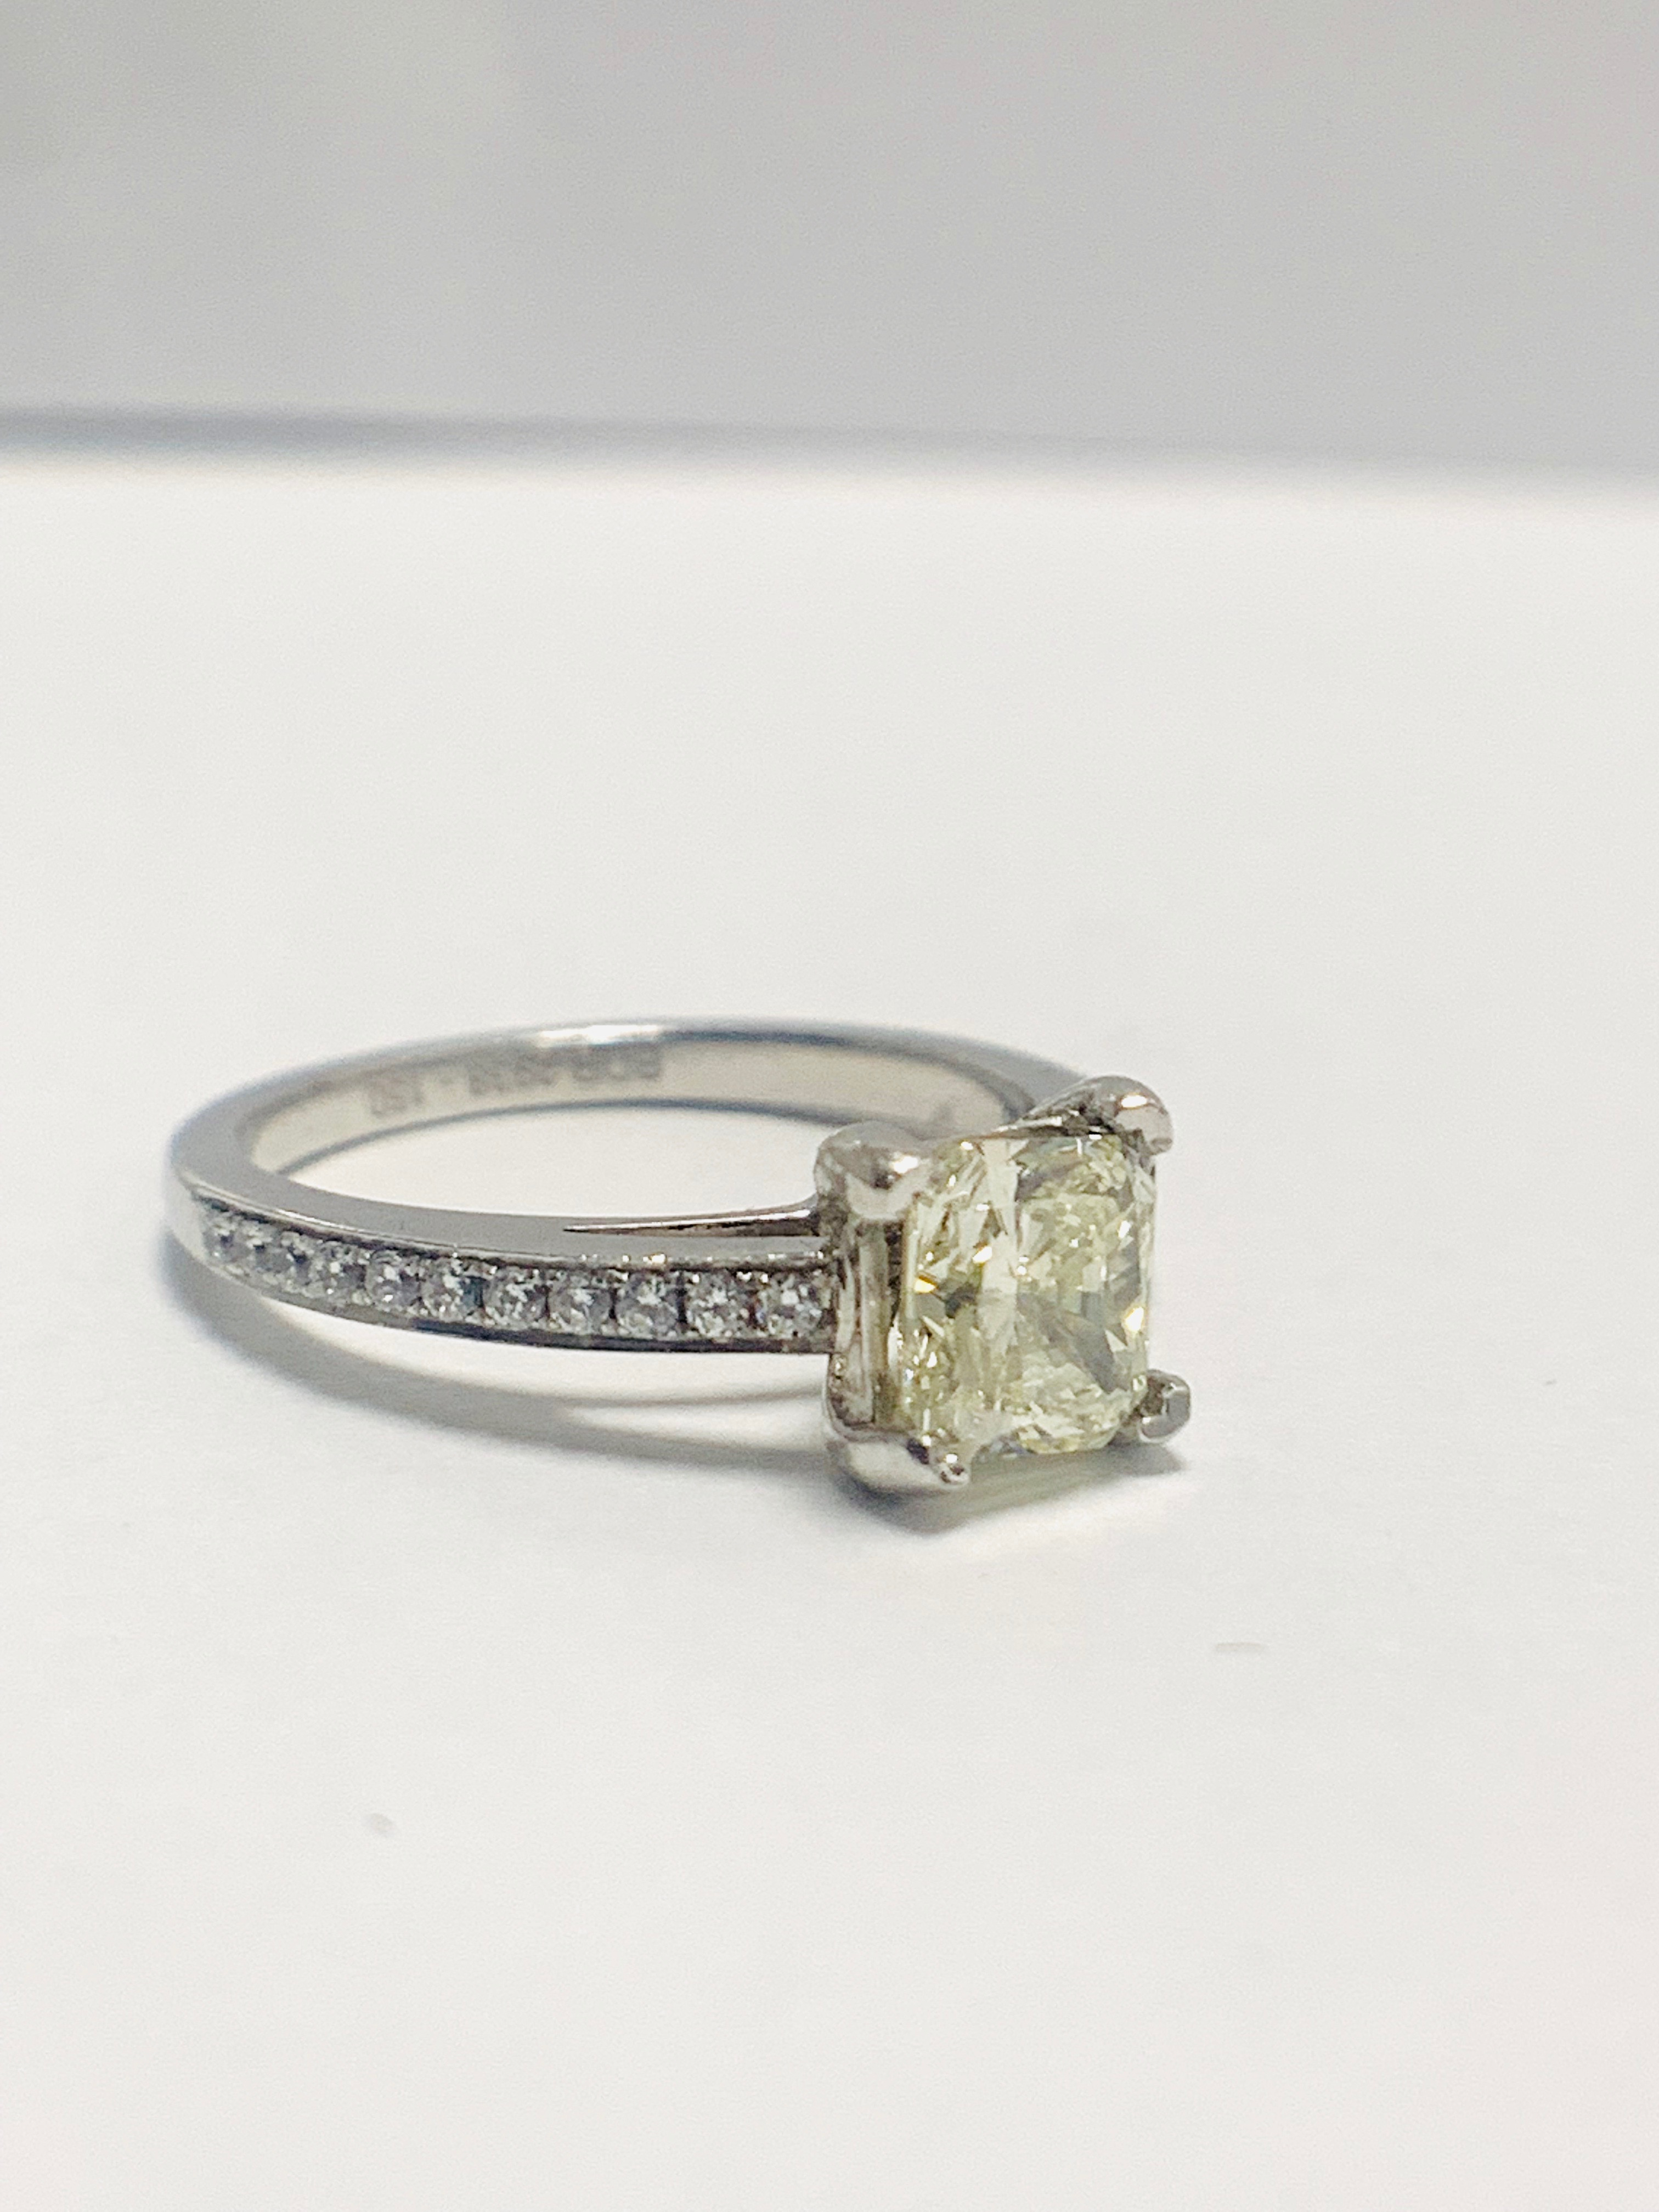 1ct cushion cut platinum diamond solitaire ring - Image 6 of 8